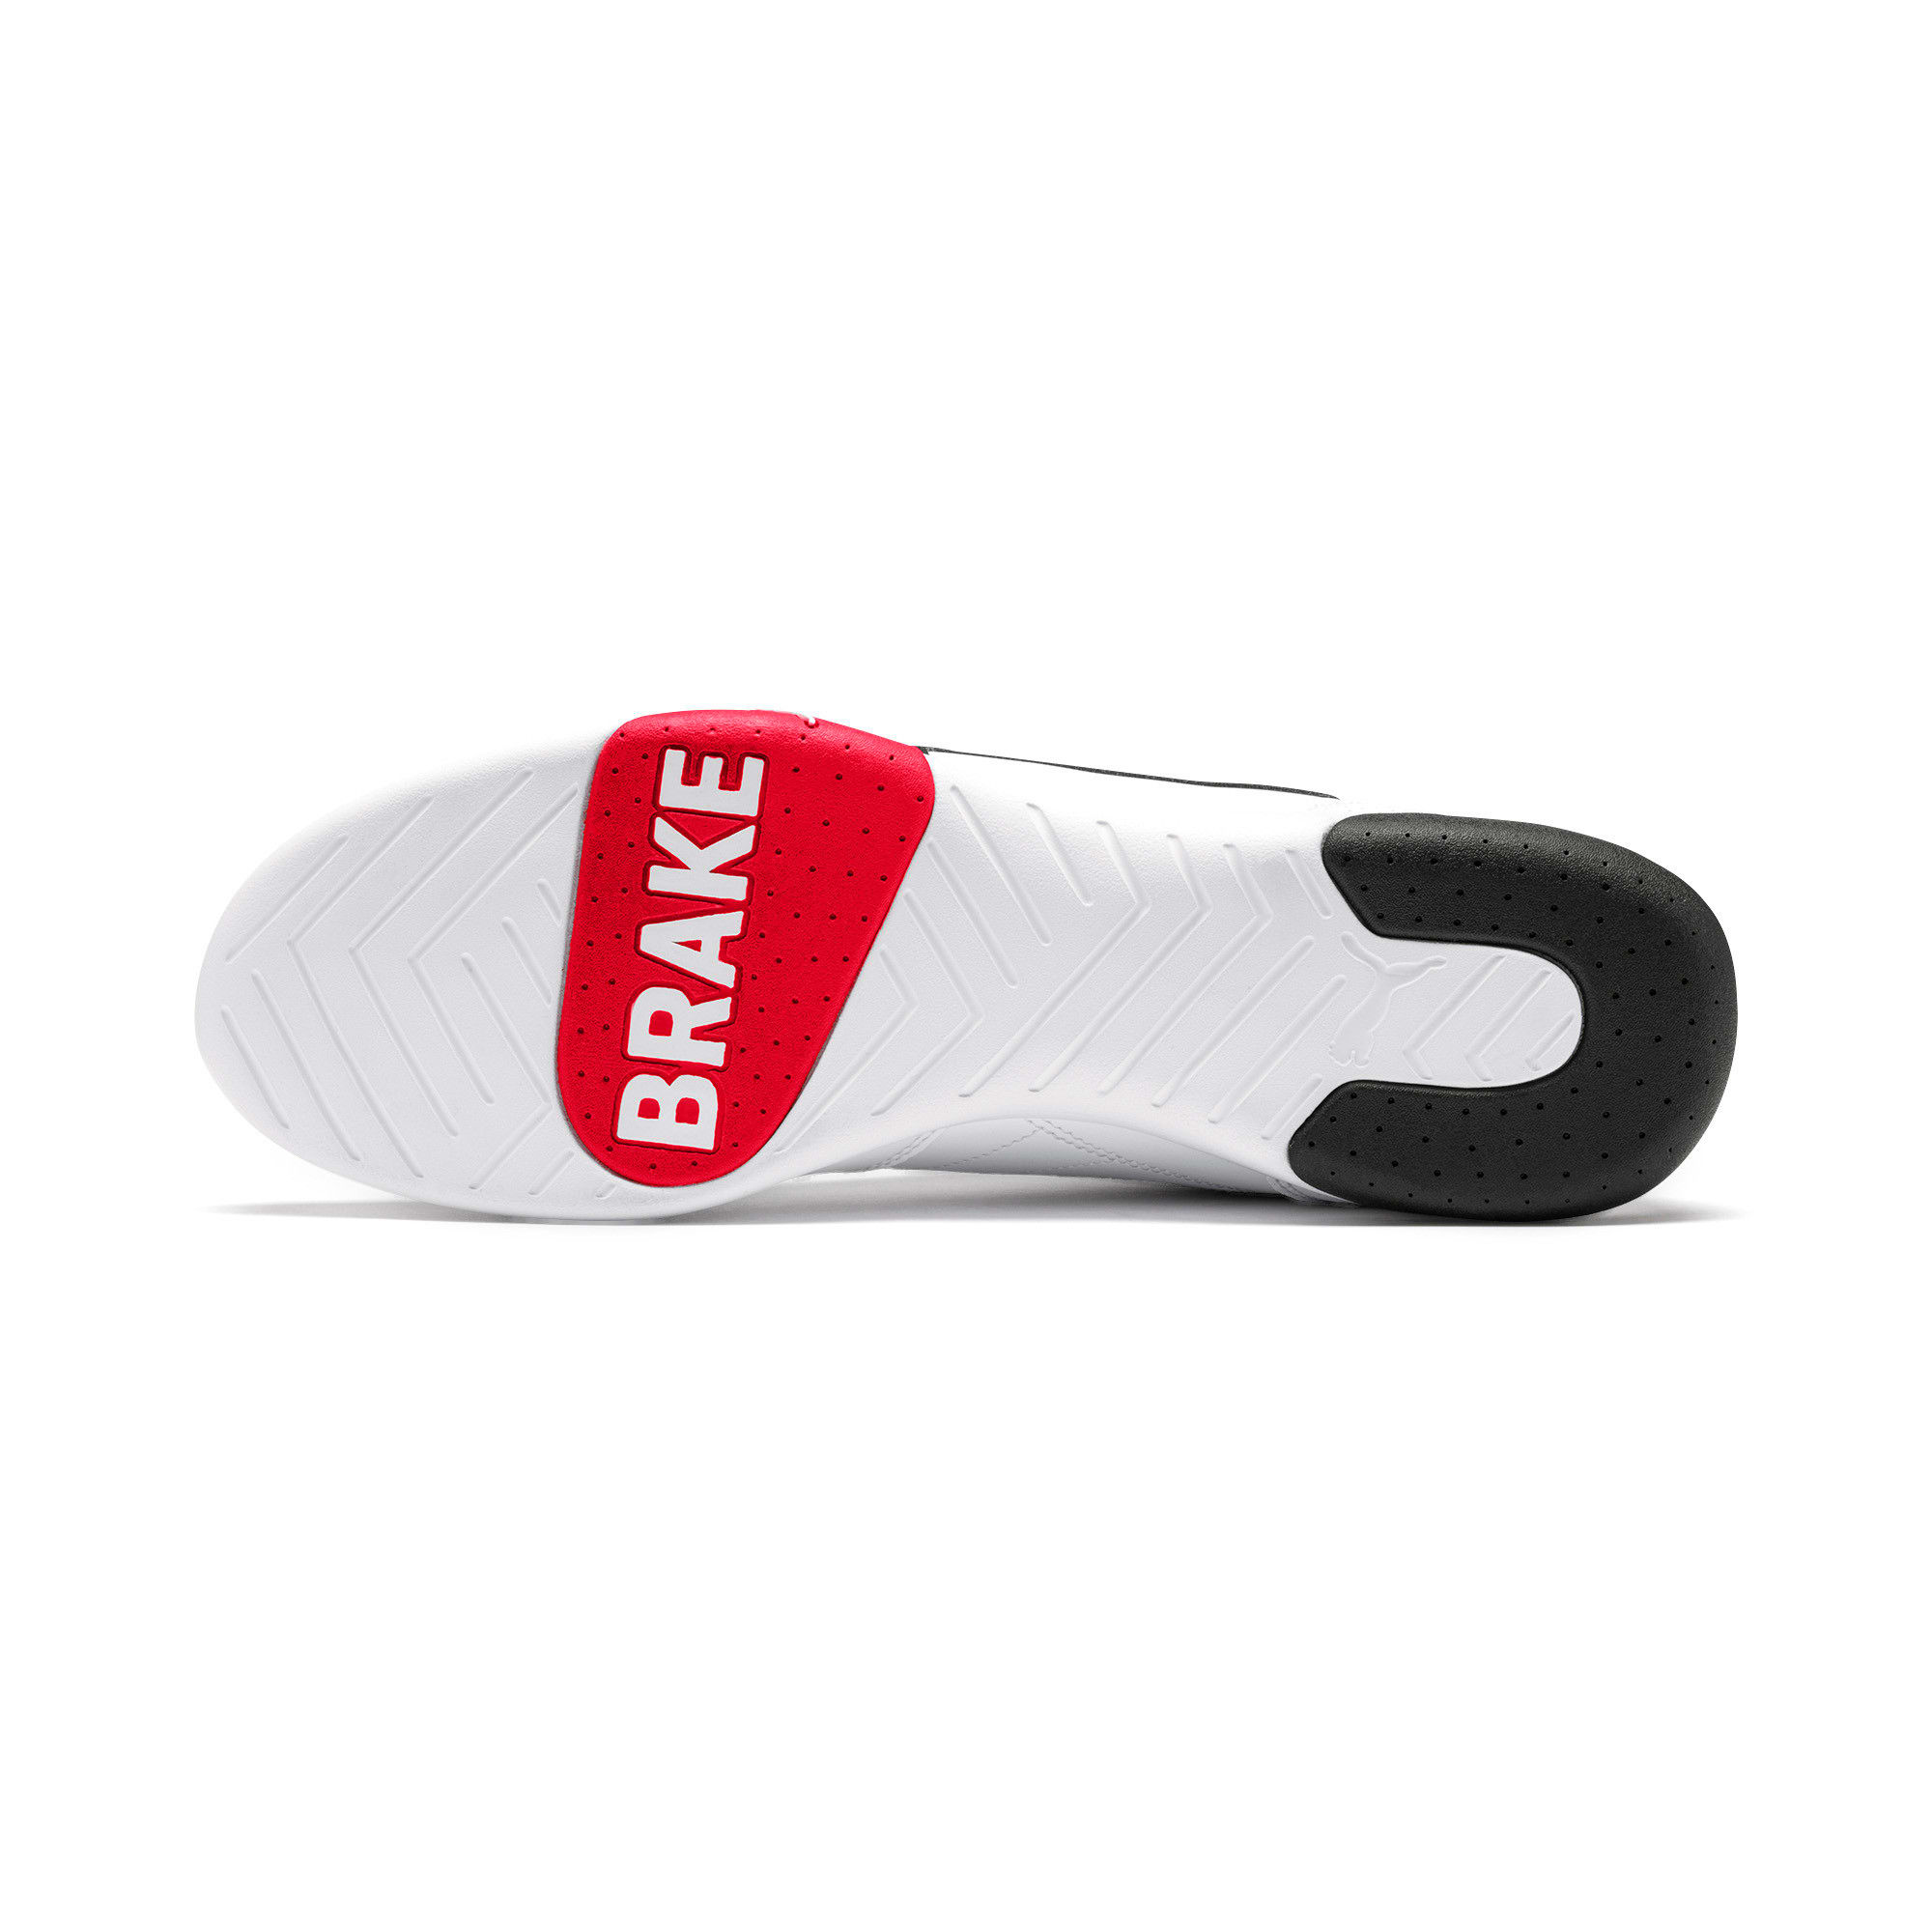 Thumbnail 3 of Scuderia Ferrari Kart Cat III Shoes, White-Black-Rosso Corsa, medium